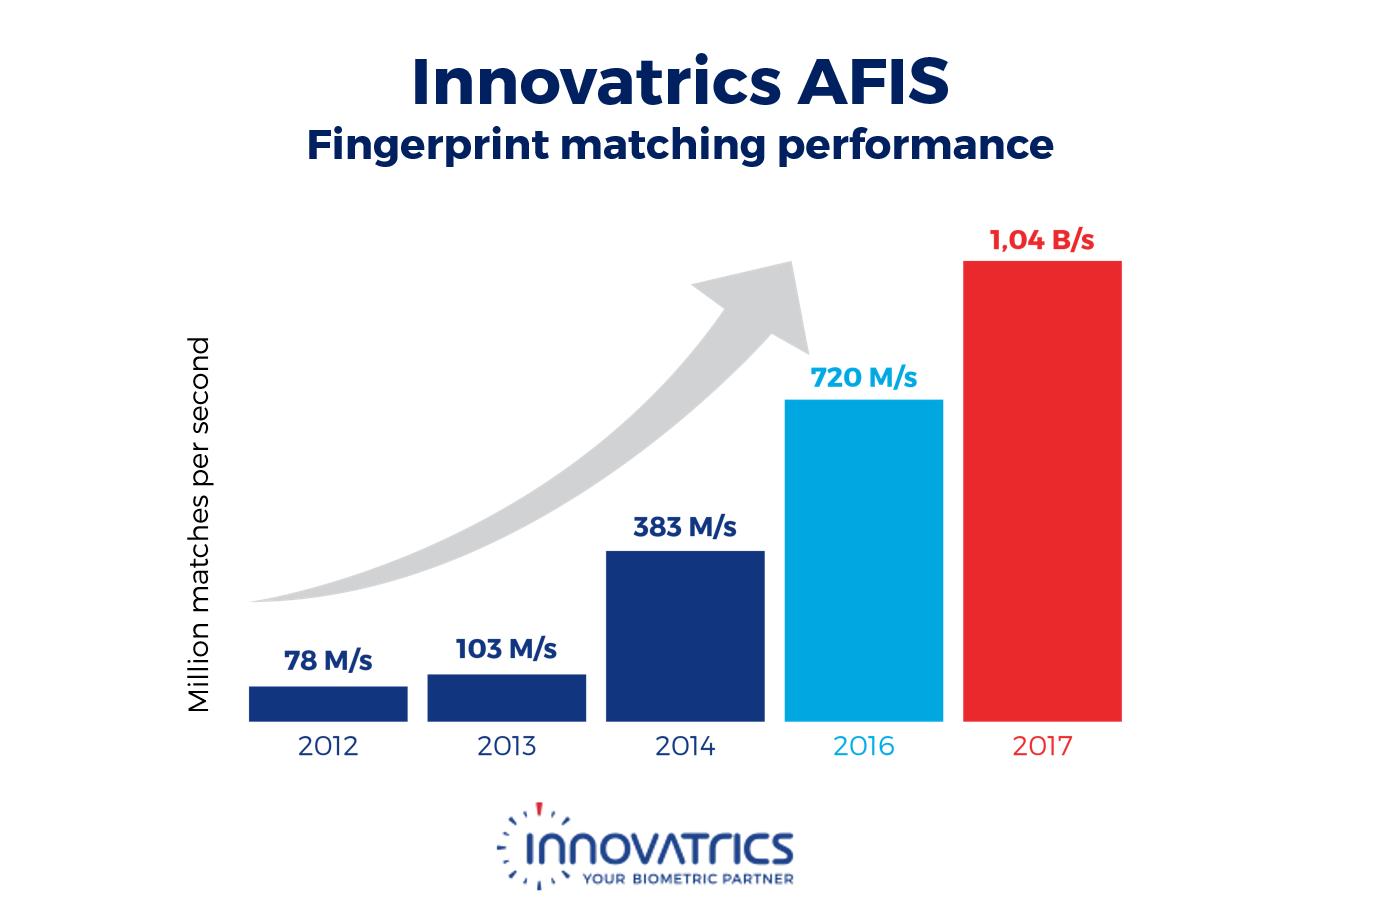 Innovatrics AFIS fingerprint matching performance